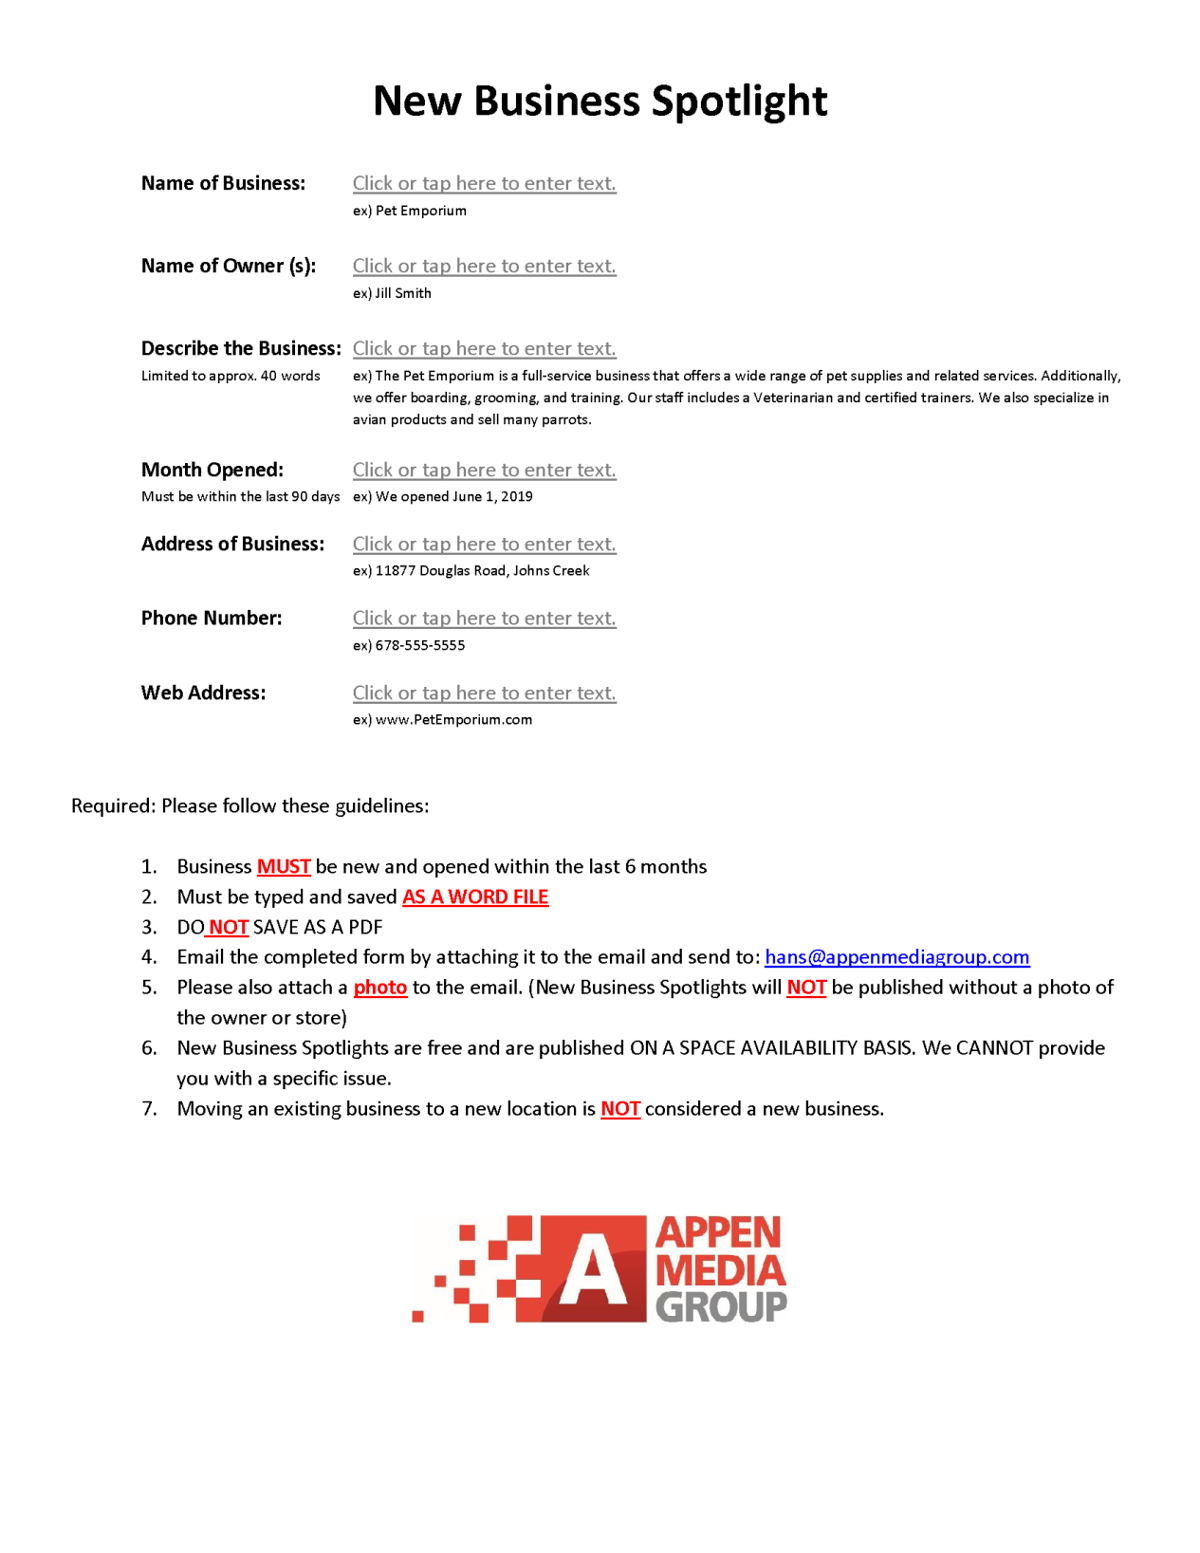 New Business Spotlight form